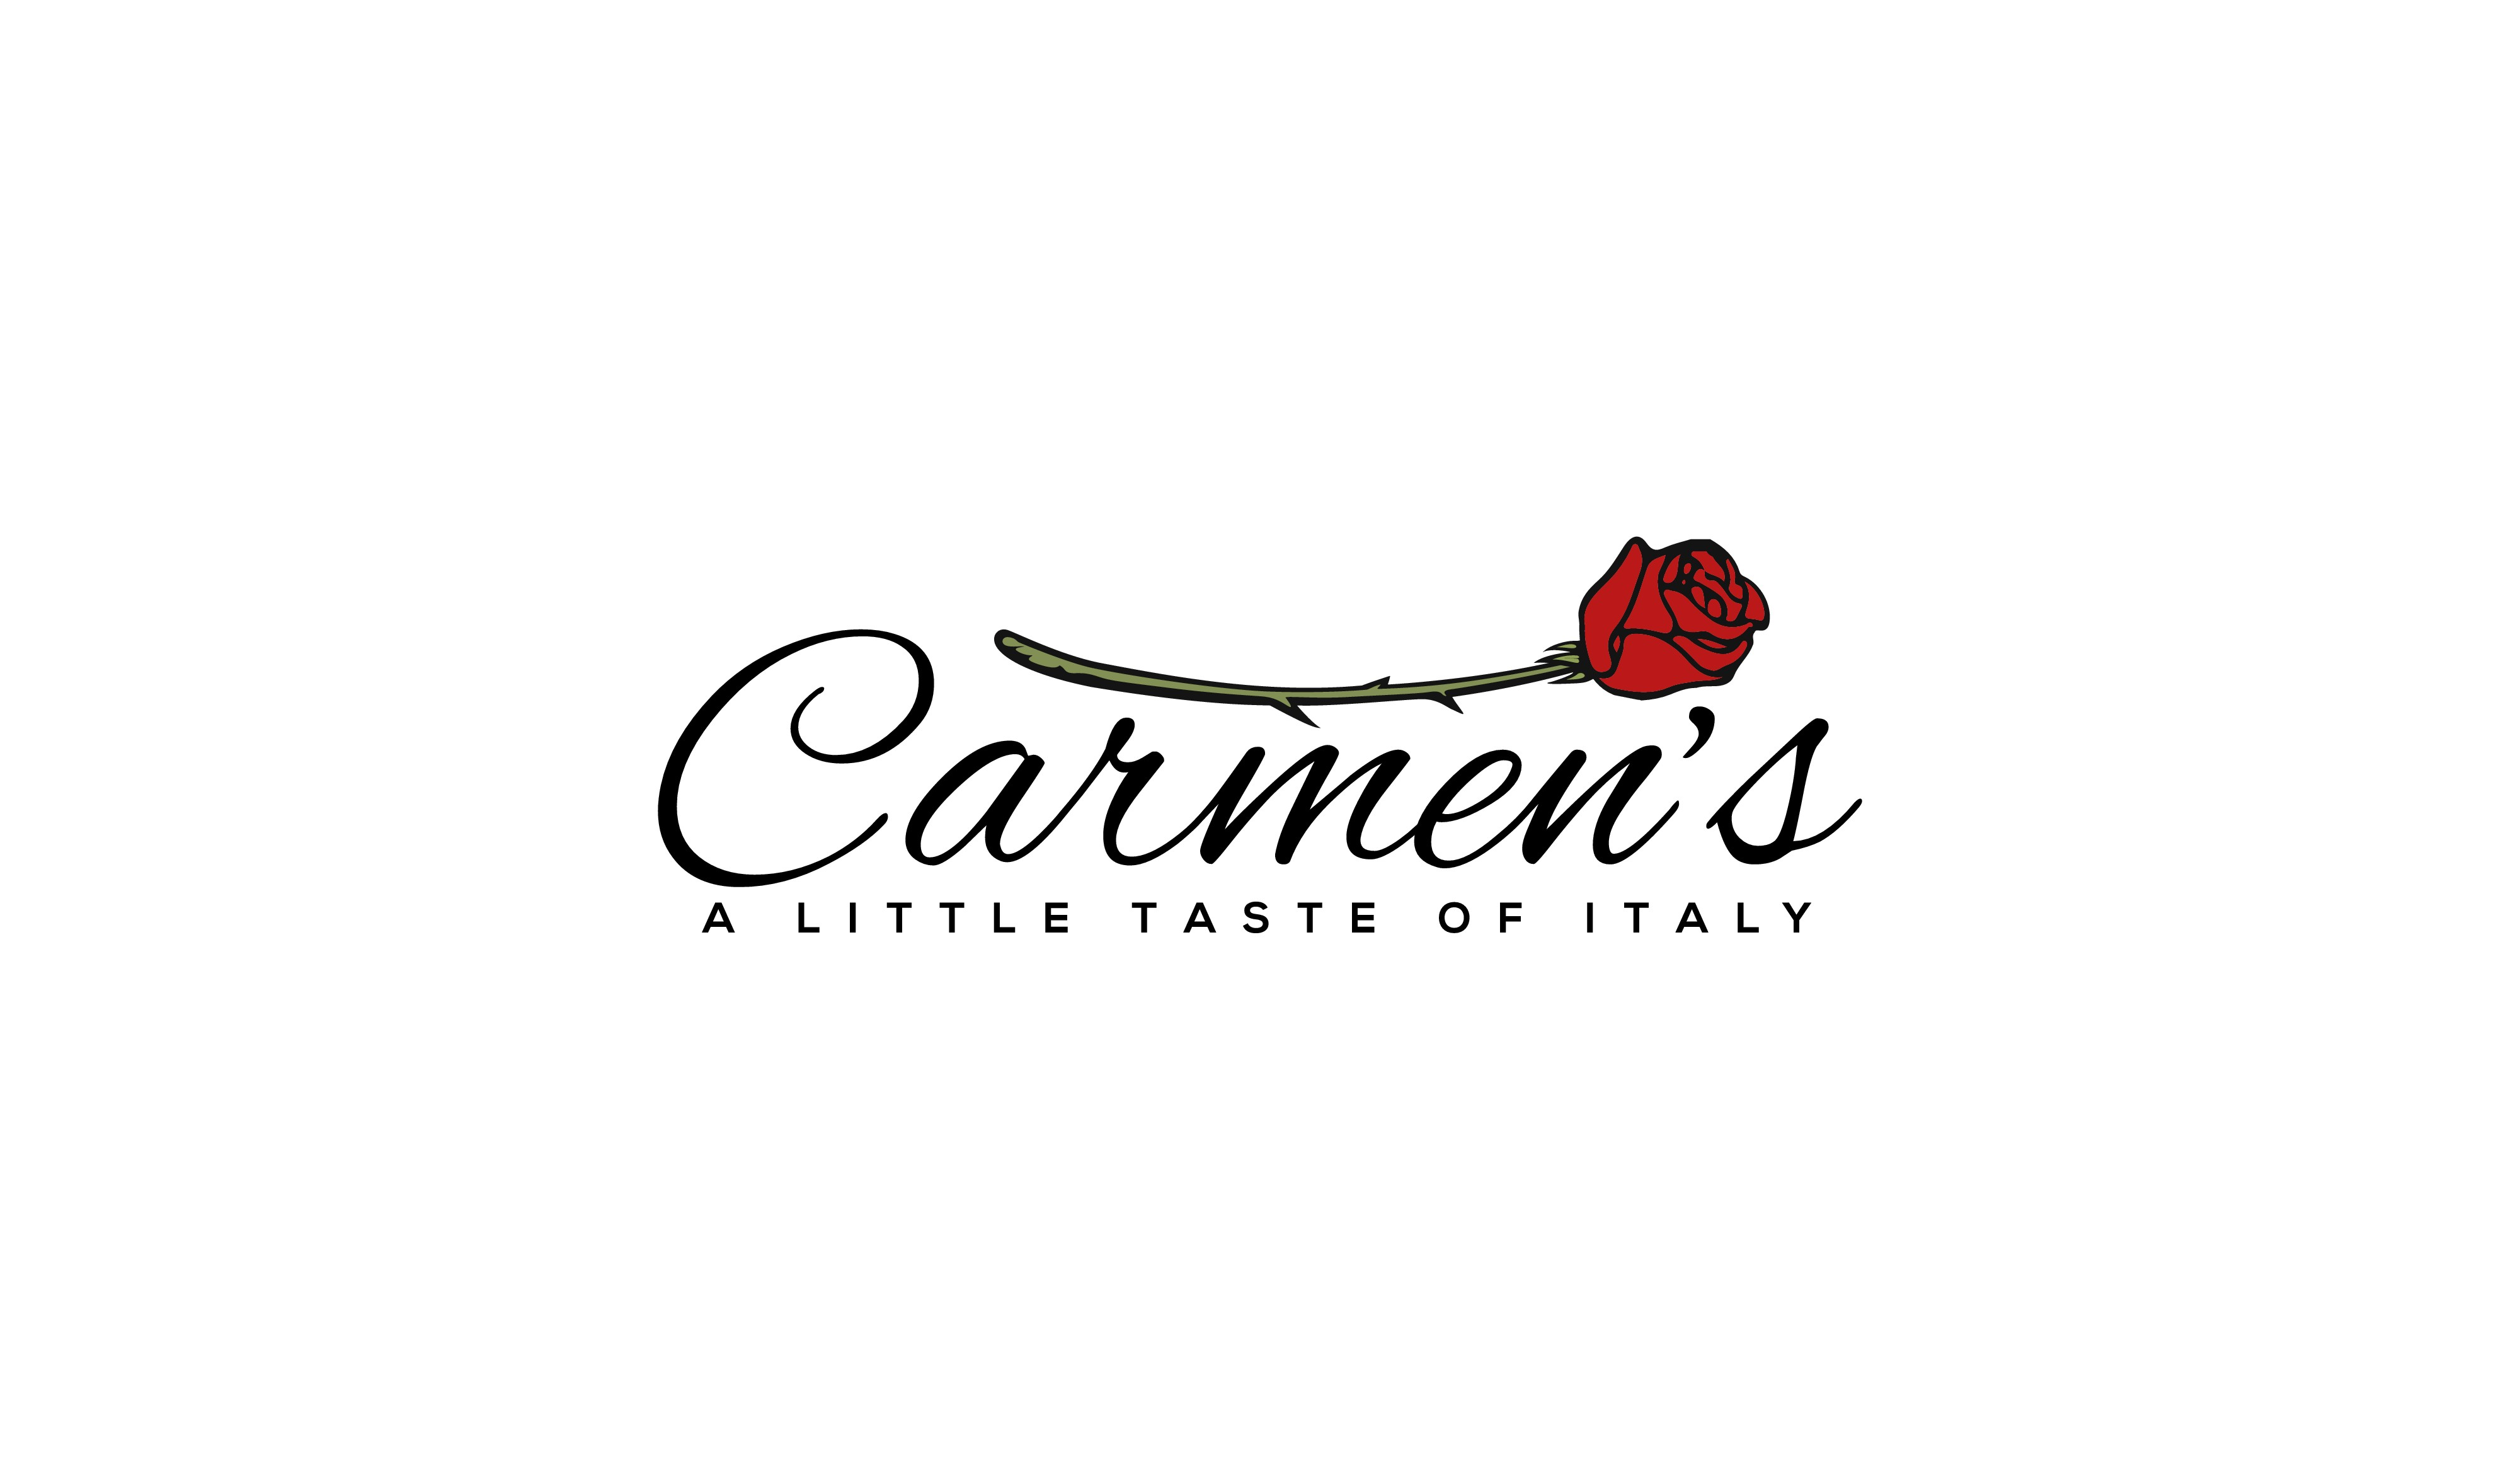 Create an elegant, sophisticated finr dining logo fora new Italian restaurant.